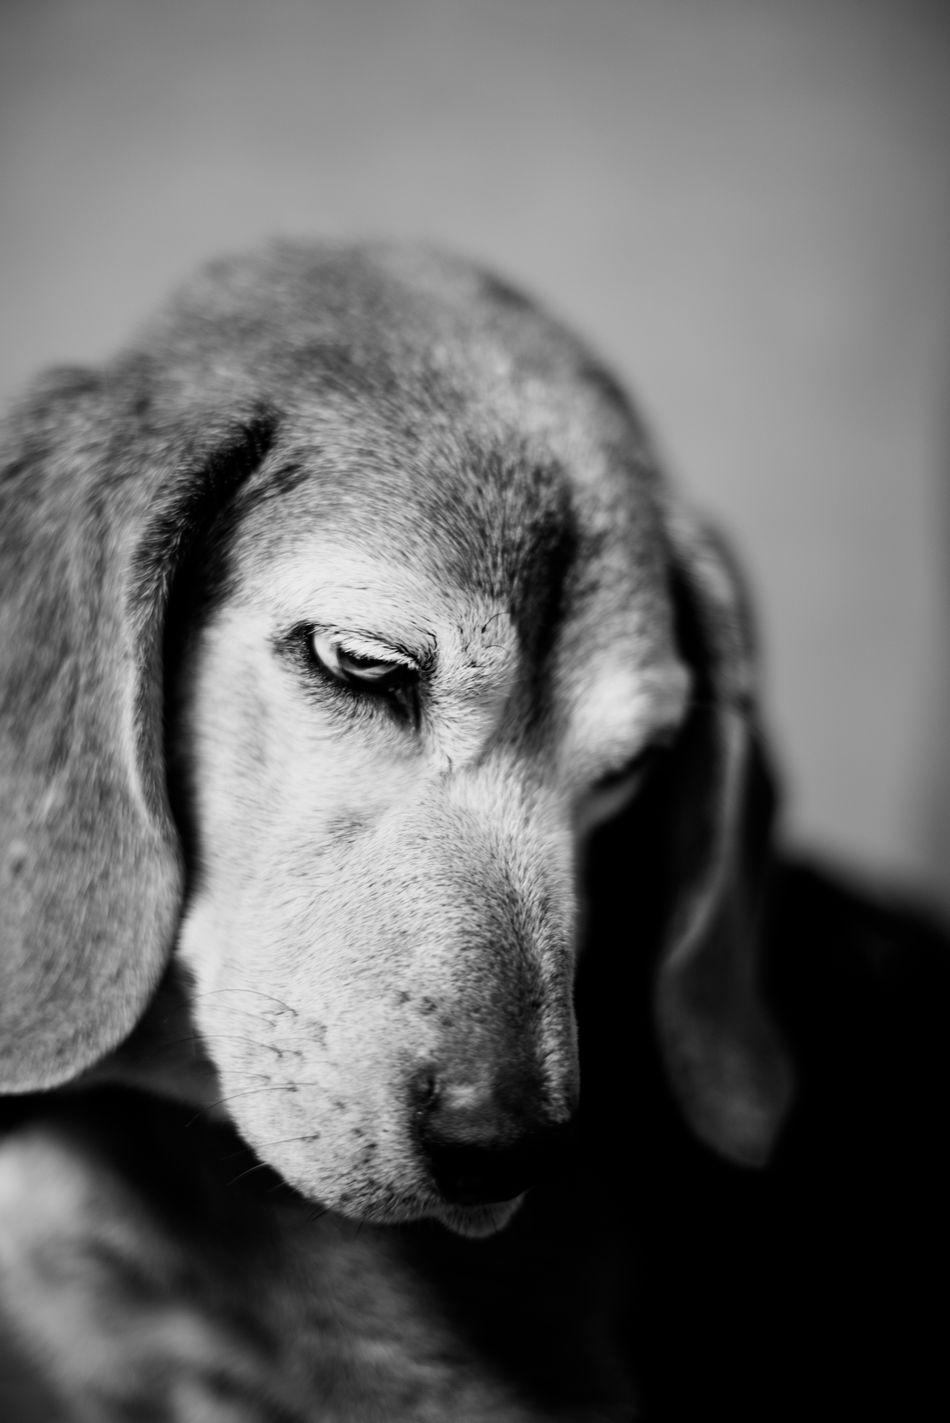 Animal Body Part Animal Head  Animal Themes Beagle Beagle Love Close-up Day Dog Dog Lifestyle Dog Photographer Dog Photography Dog Portrait Domestic Animals Indoors  Mammal No People One Animal Pet Photographer Pet Photography  Pet Portrait Pet Portraits Pet Portraiture Pets Portrait My Love